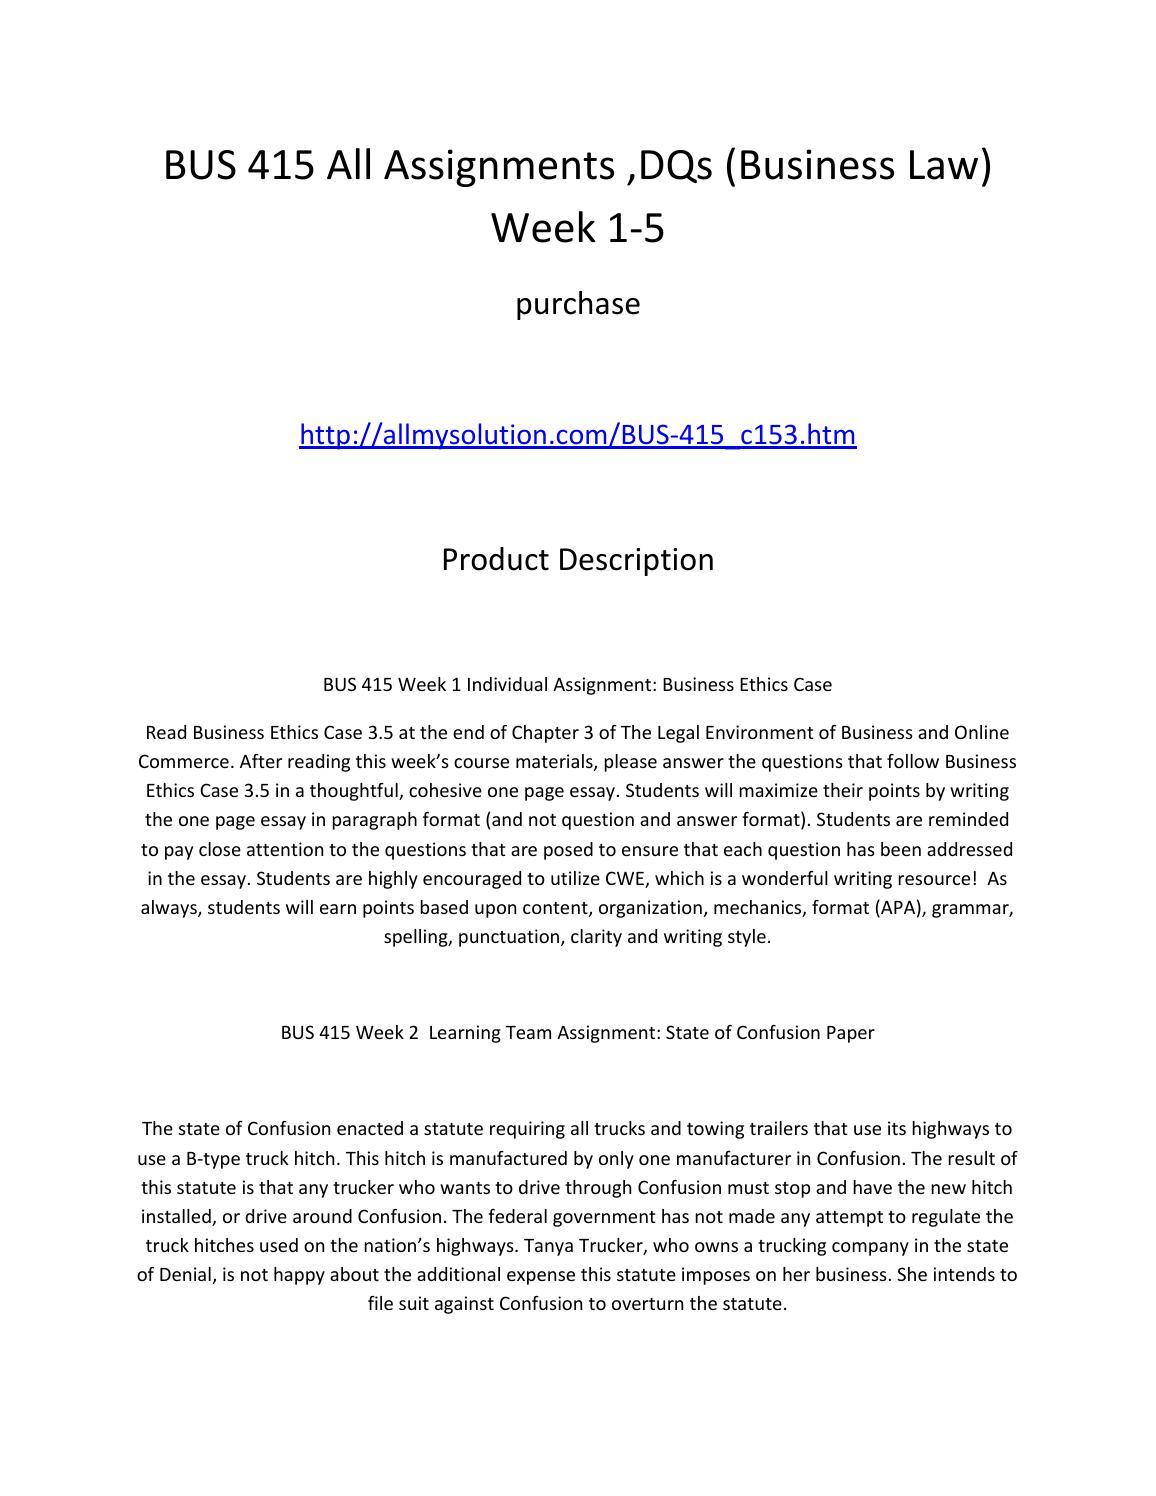 High quality cheap custom essays - Writecustomesays.com